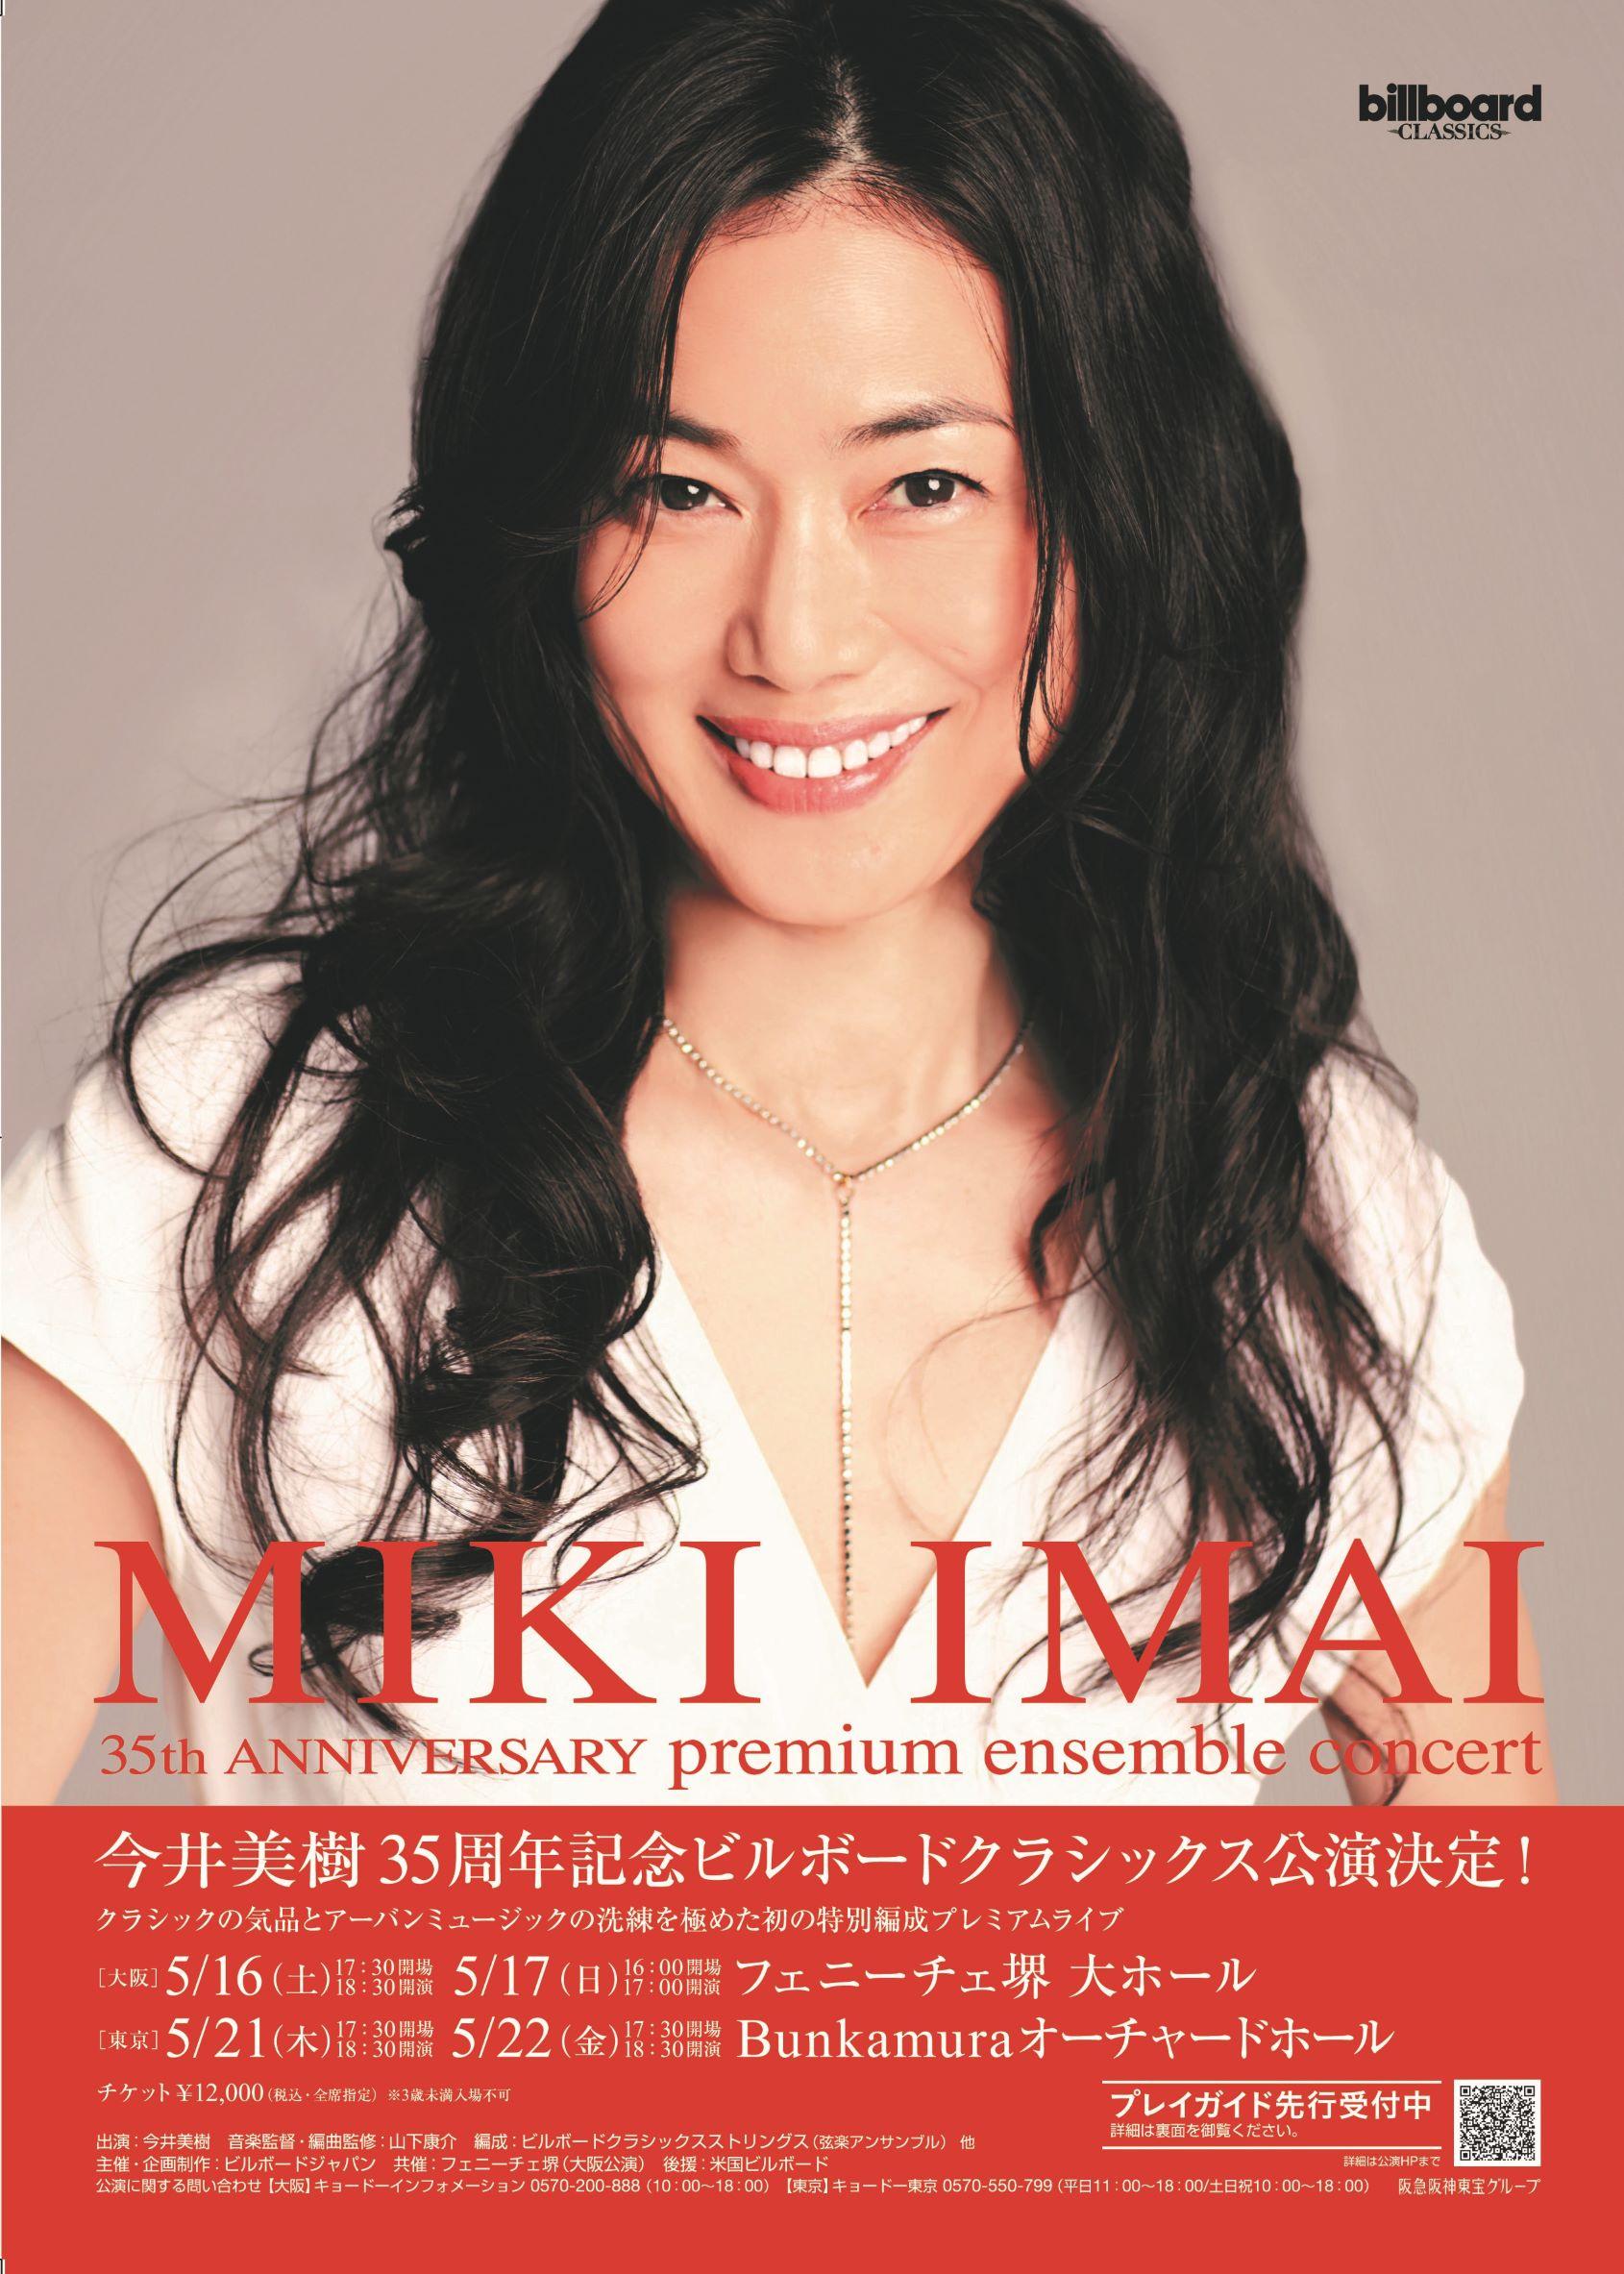 【延期/振替】今井美樹 billboard classics MIKI IMAI 35th Anniversary premium ensemble concert